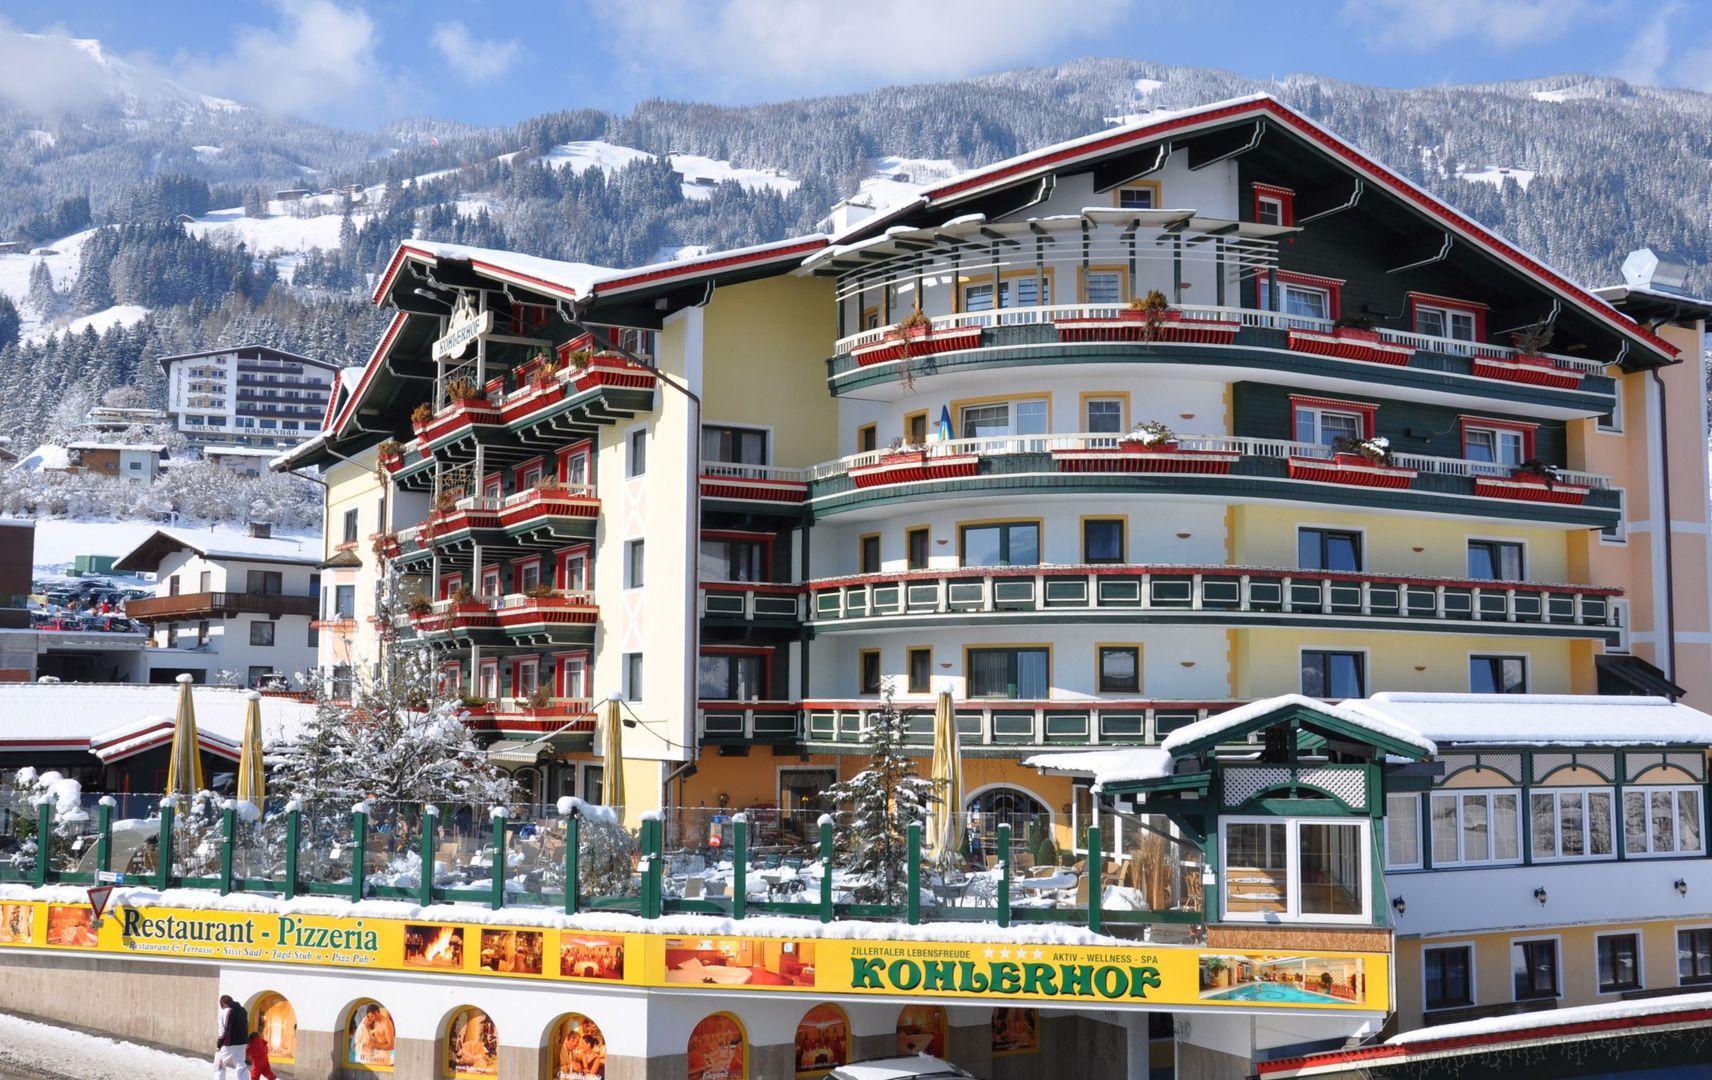 Hotel Activ Kohlerhof